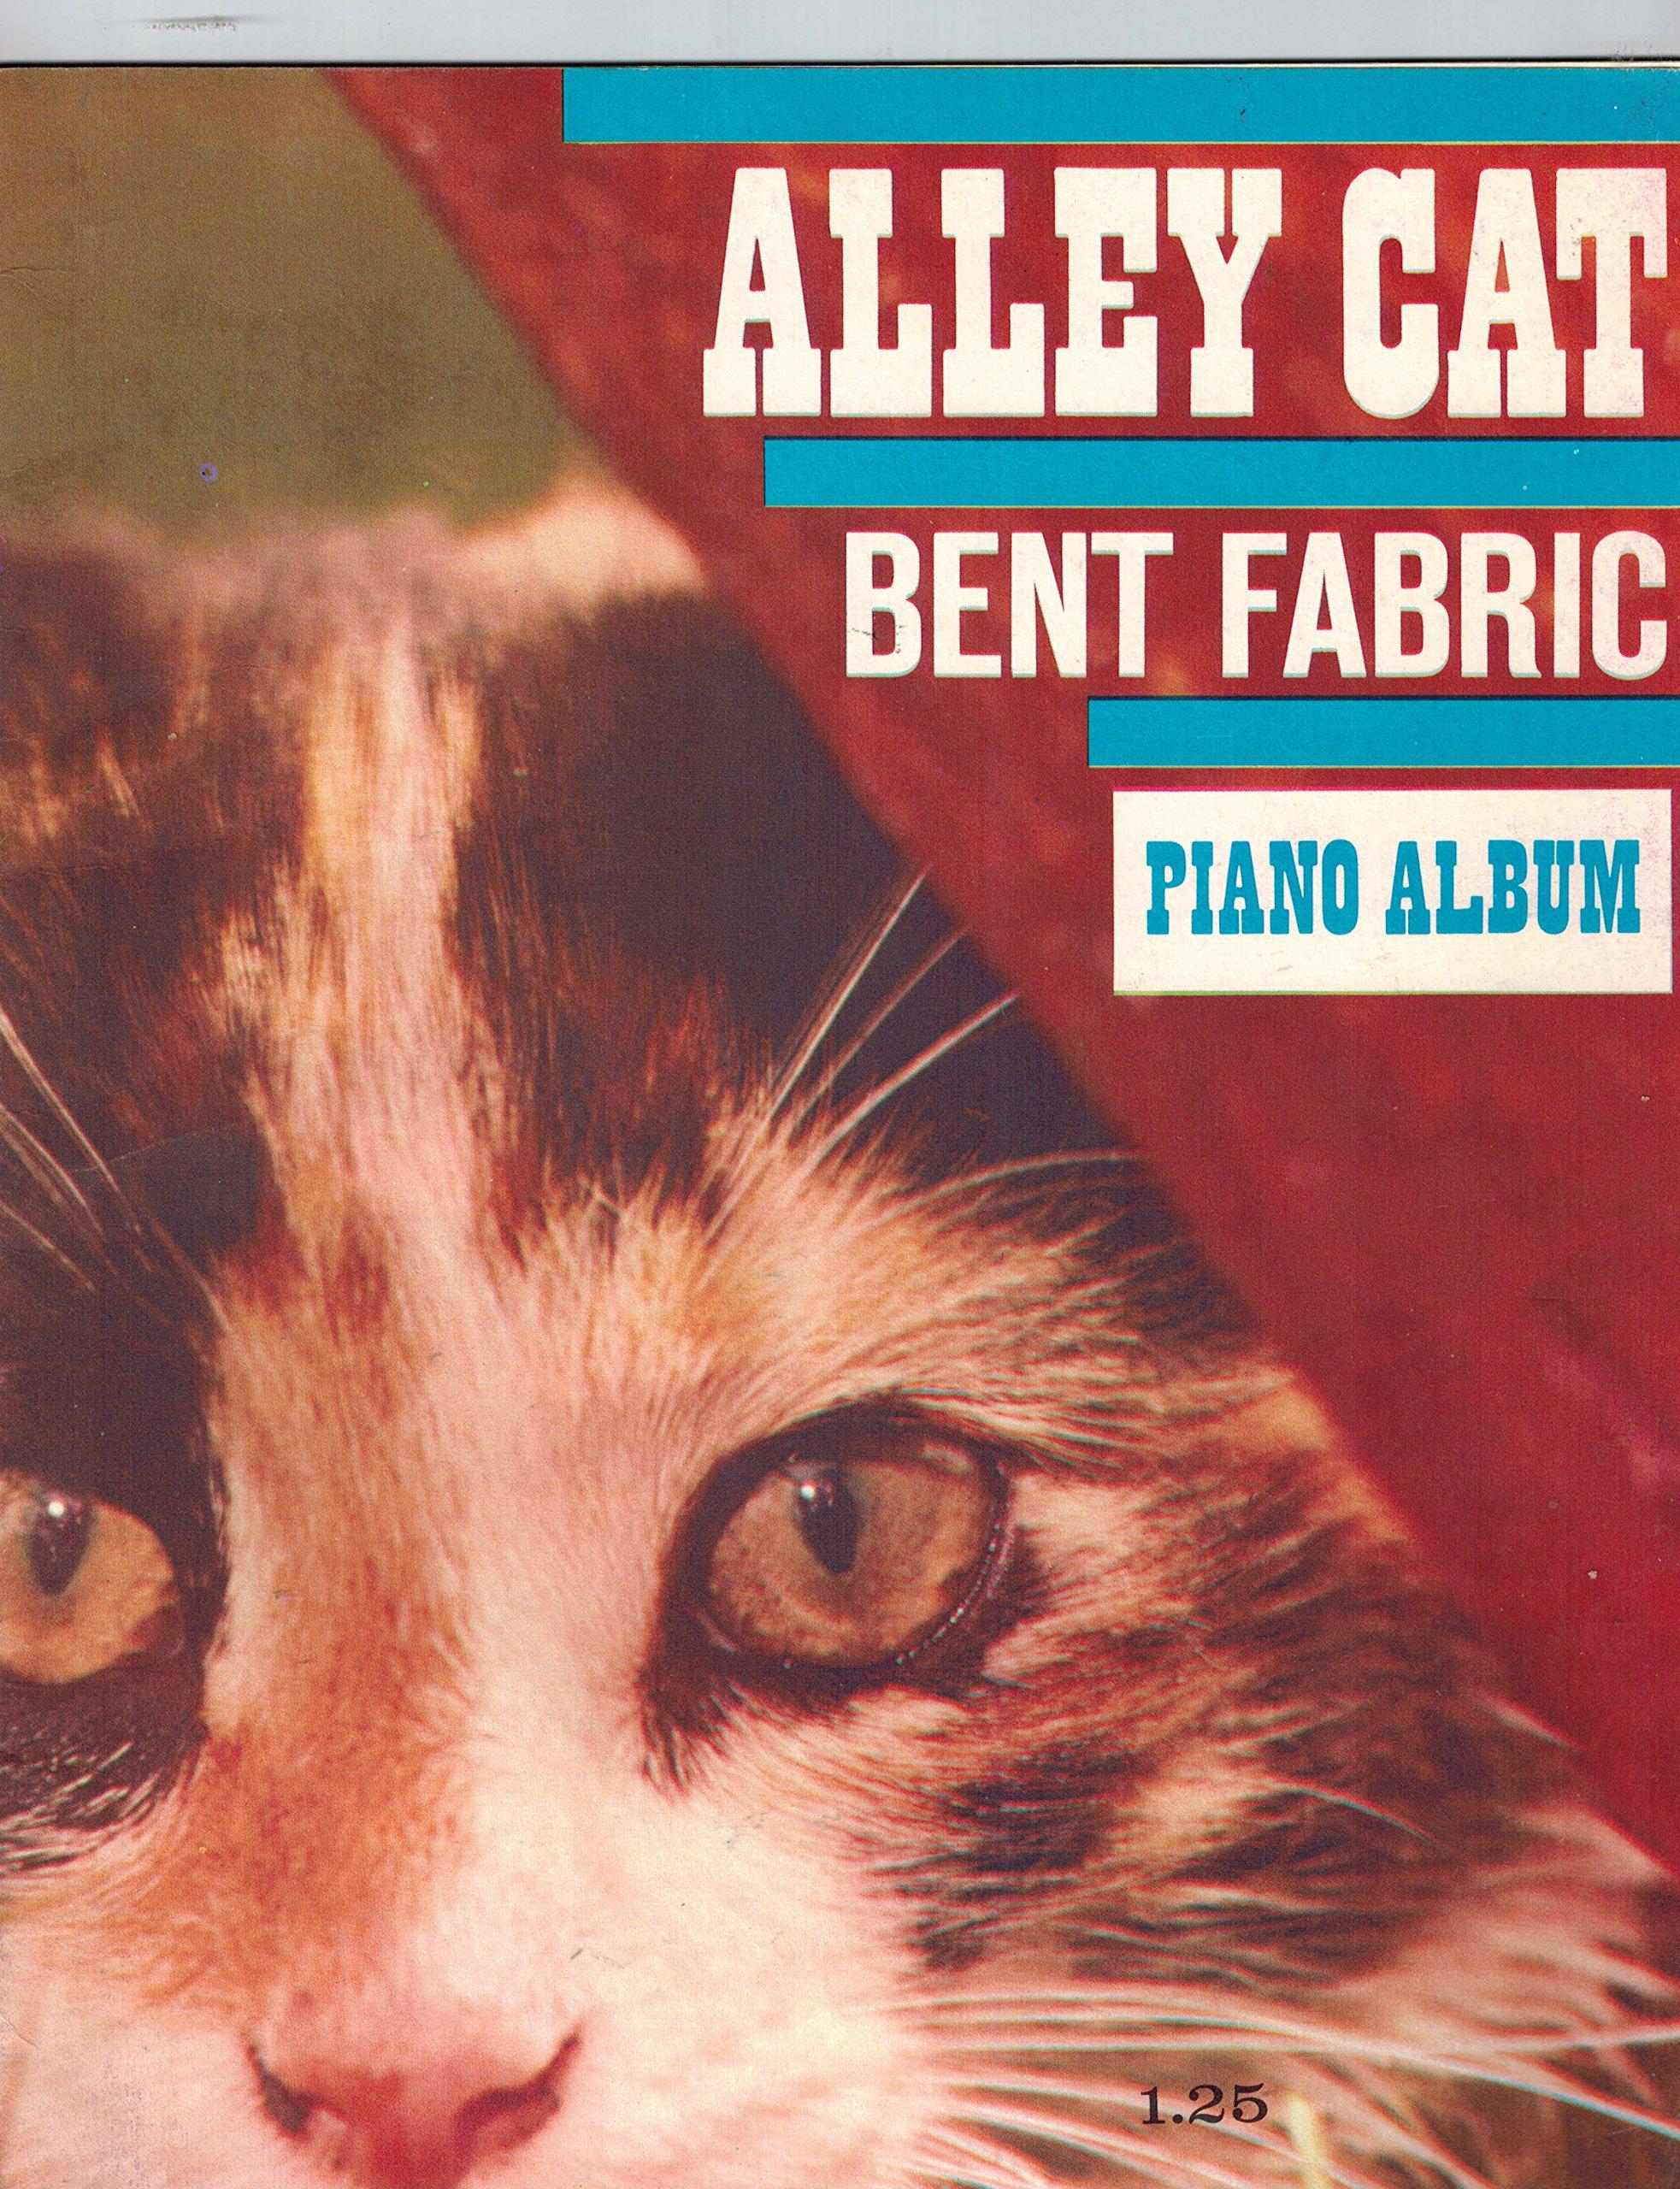 Alley Cat Bent Fabric Piano Album Frank Bjorn, Bent